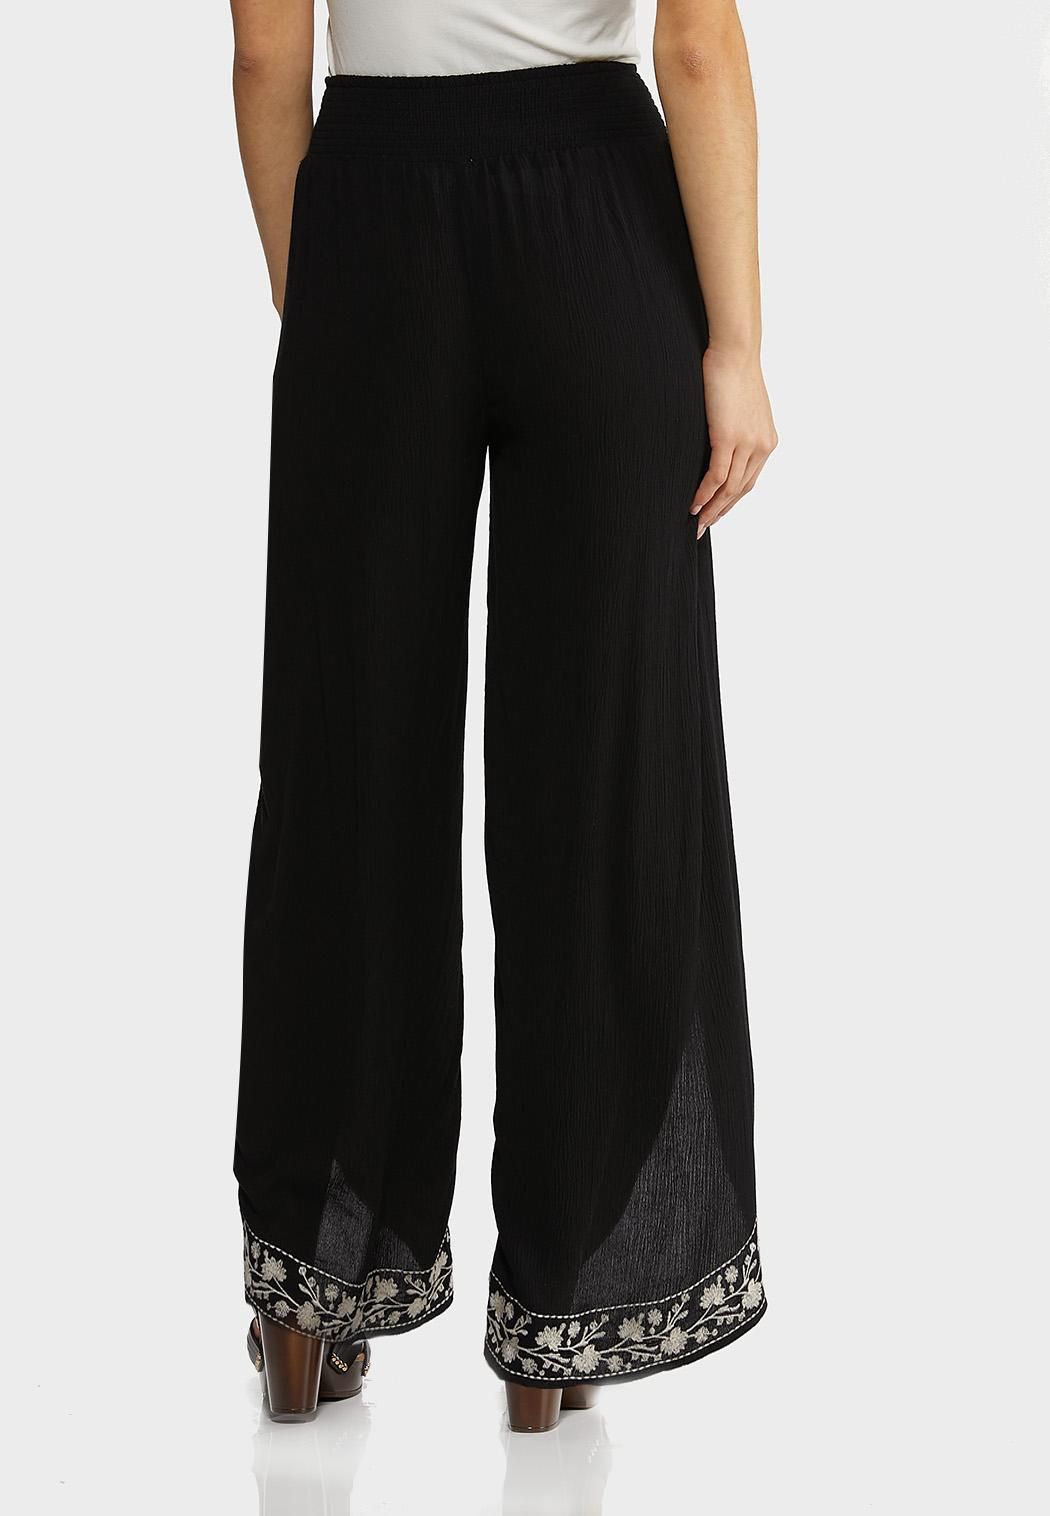 Gauzy Embroidered Flyaway Pants (Item #44257903)